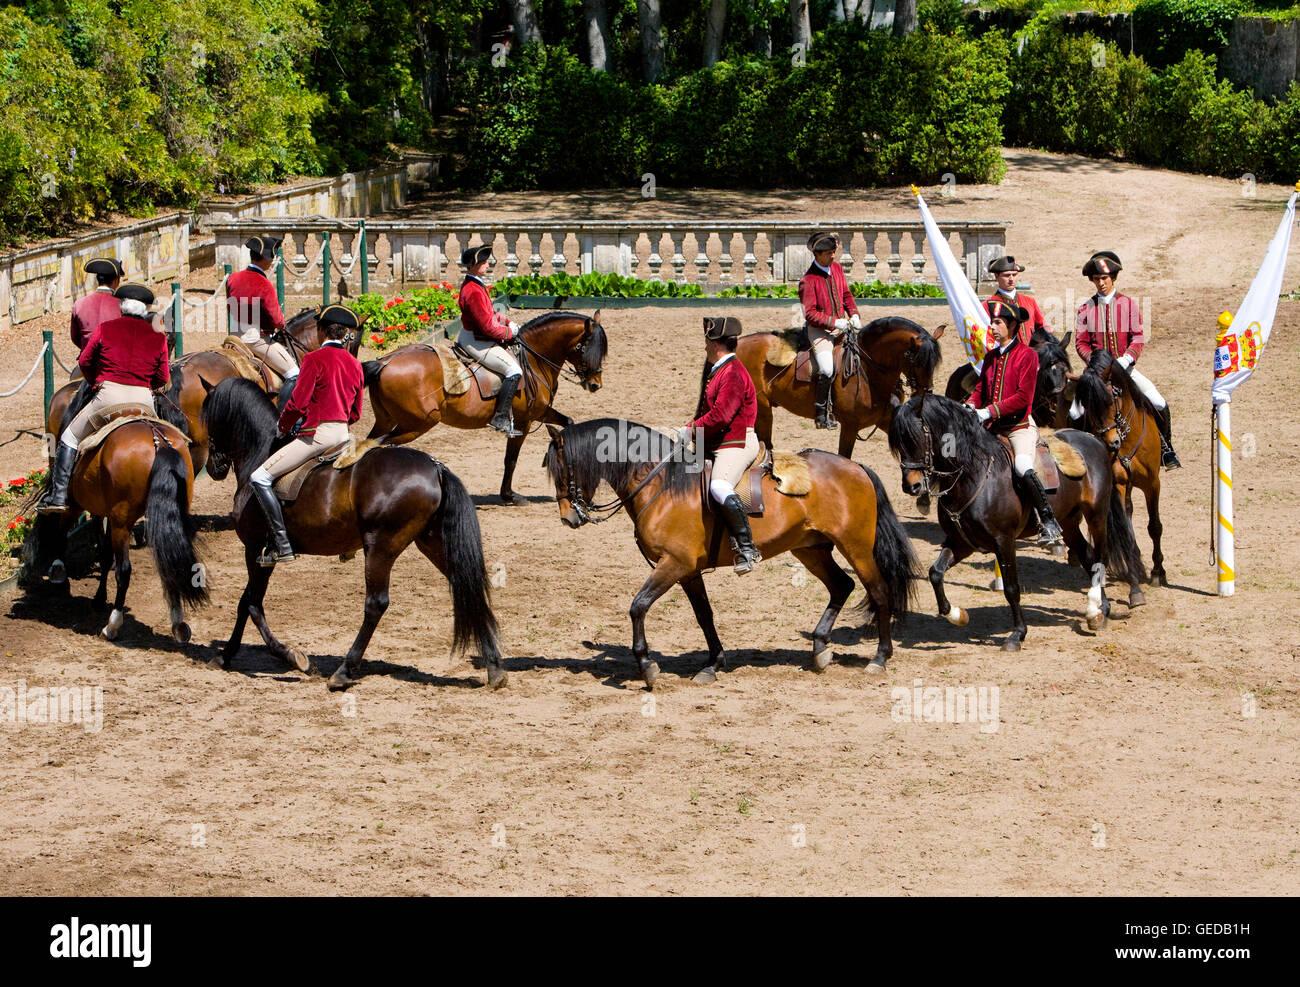 Riders of the Escola Portuguesa de Arte Equestre performing a quadrille. Queluz, Portugal. For editorial use only - Stock Image